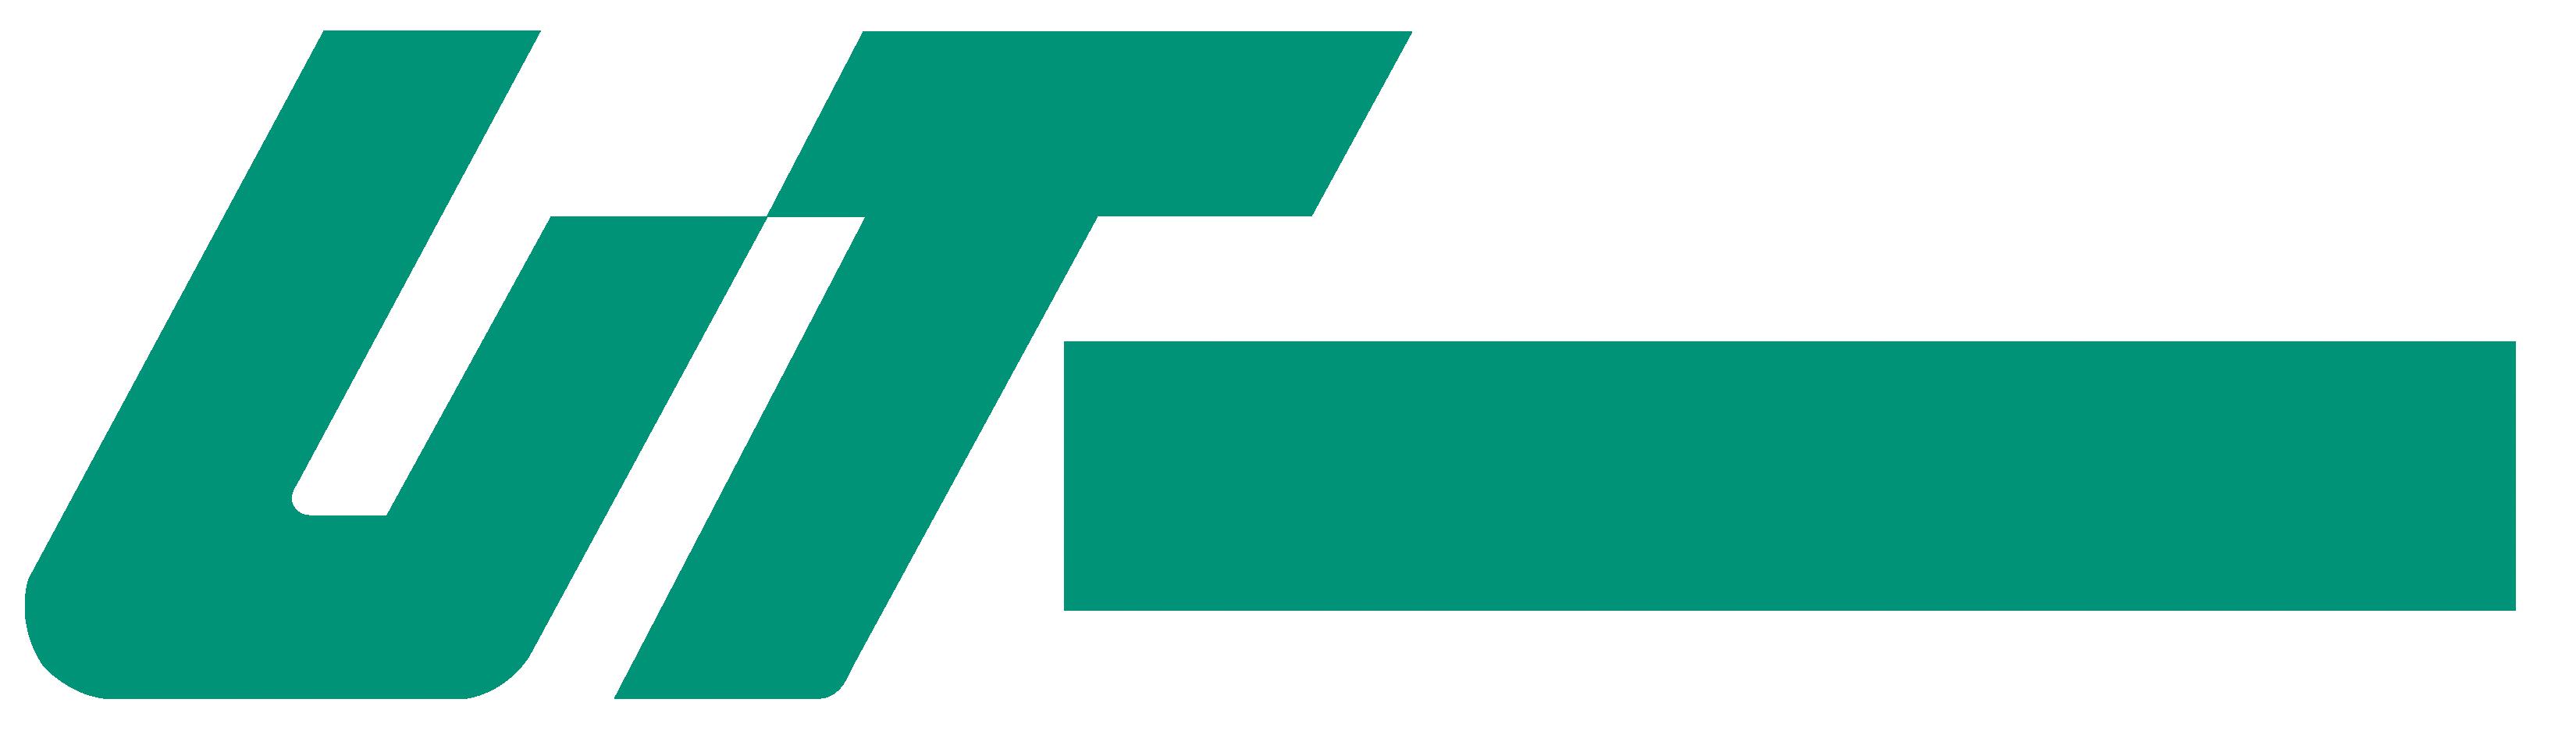 universidad-tecnologica-de-chetumal